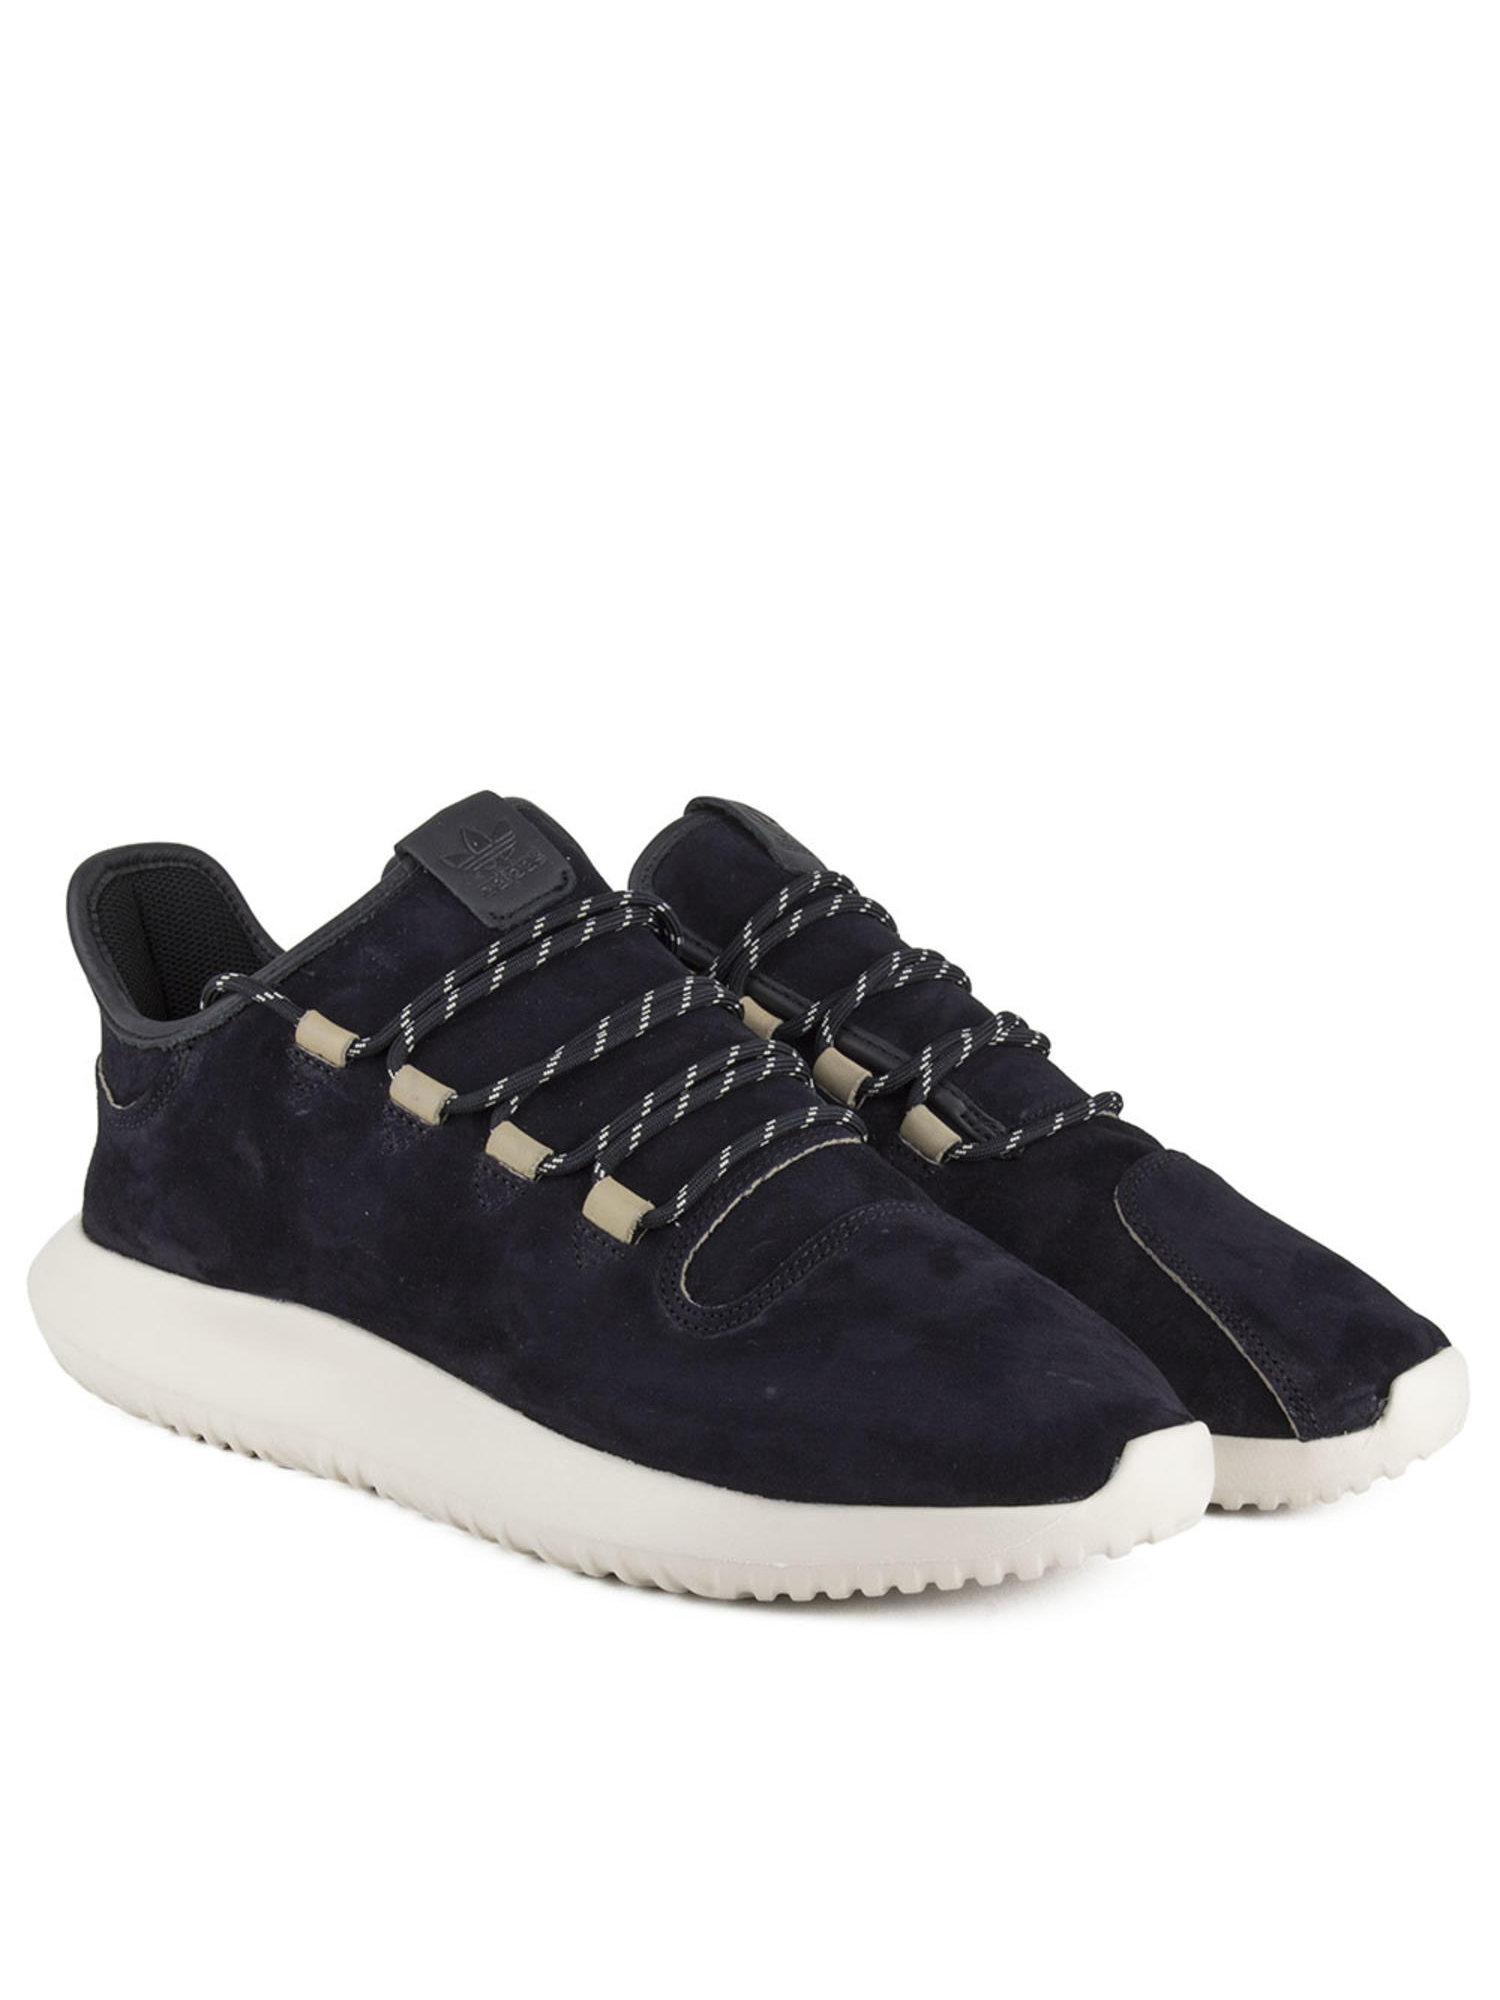 promo code f8ac9 91895 Adidas-Chaussures-sportif-Shoes-Sport-Originals-Tubular-Shadow-